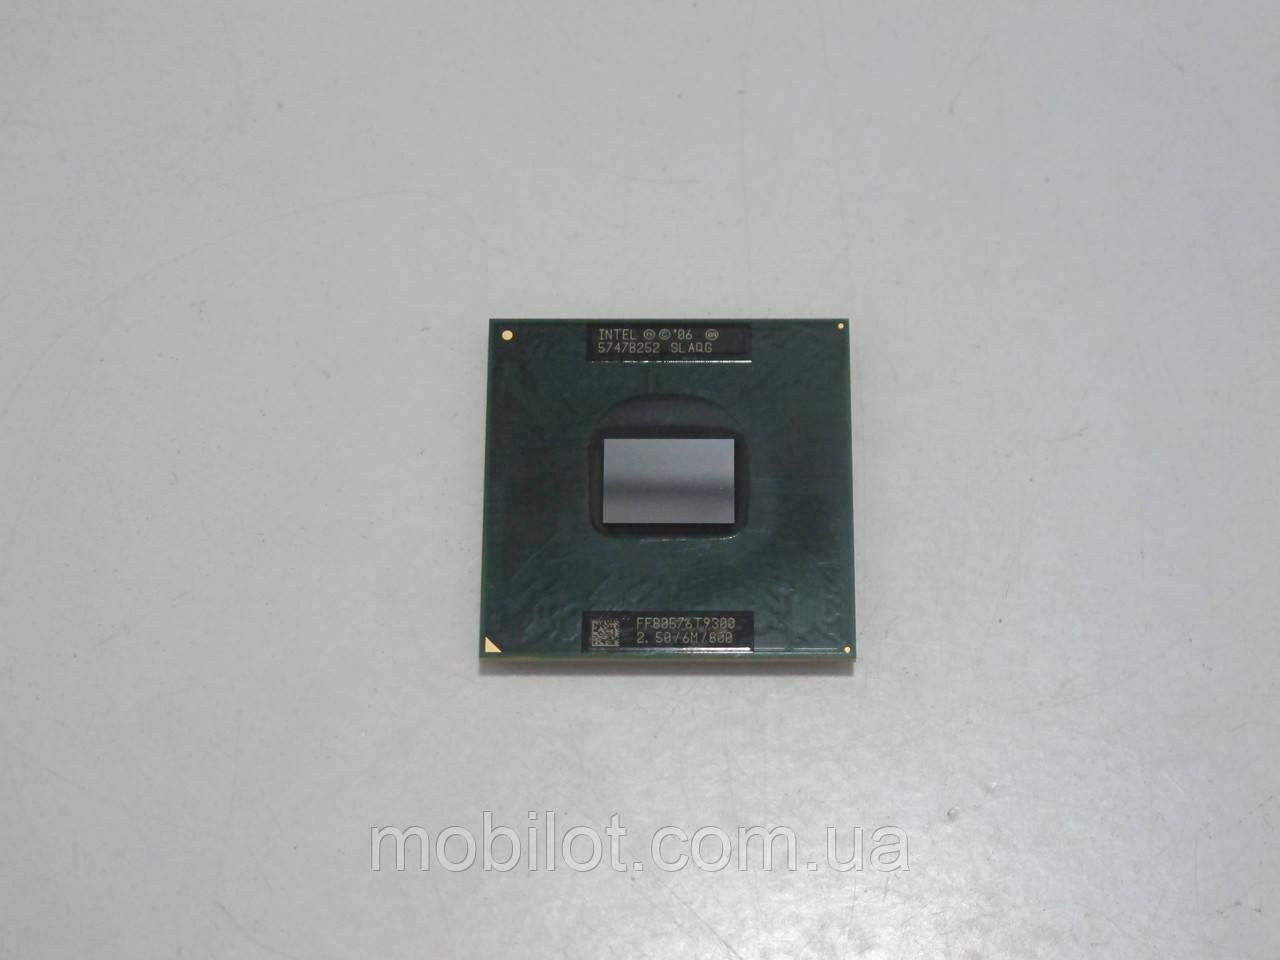 Процессор Intel Core 2 Duo T9300 (NZ-6440)